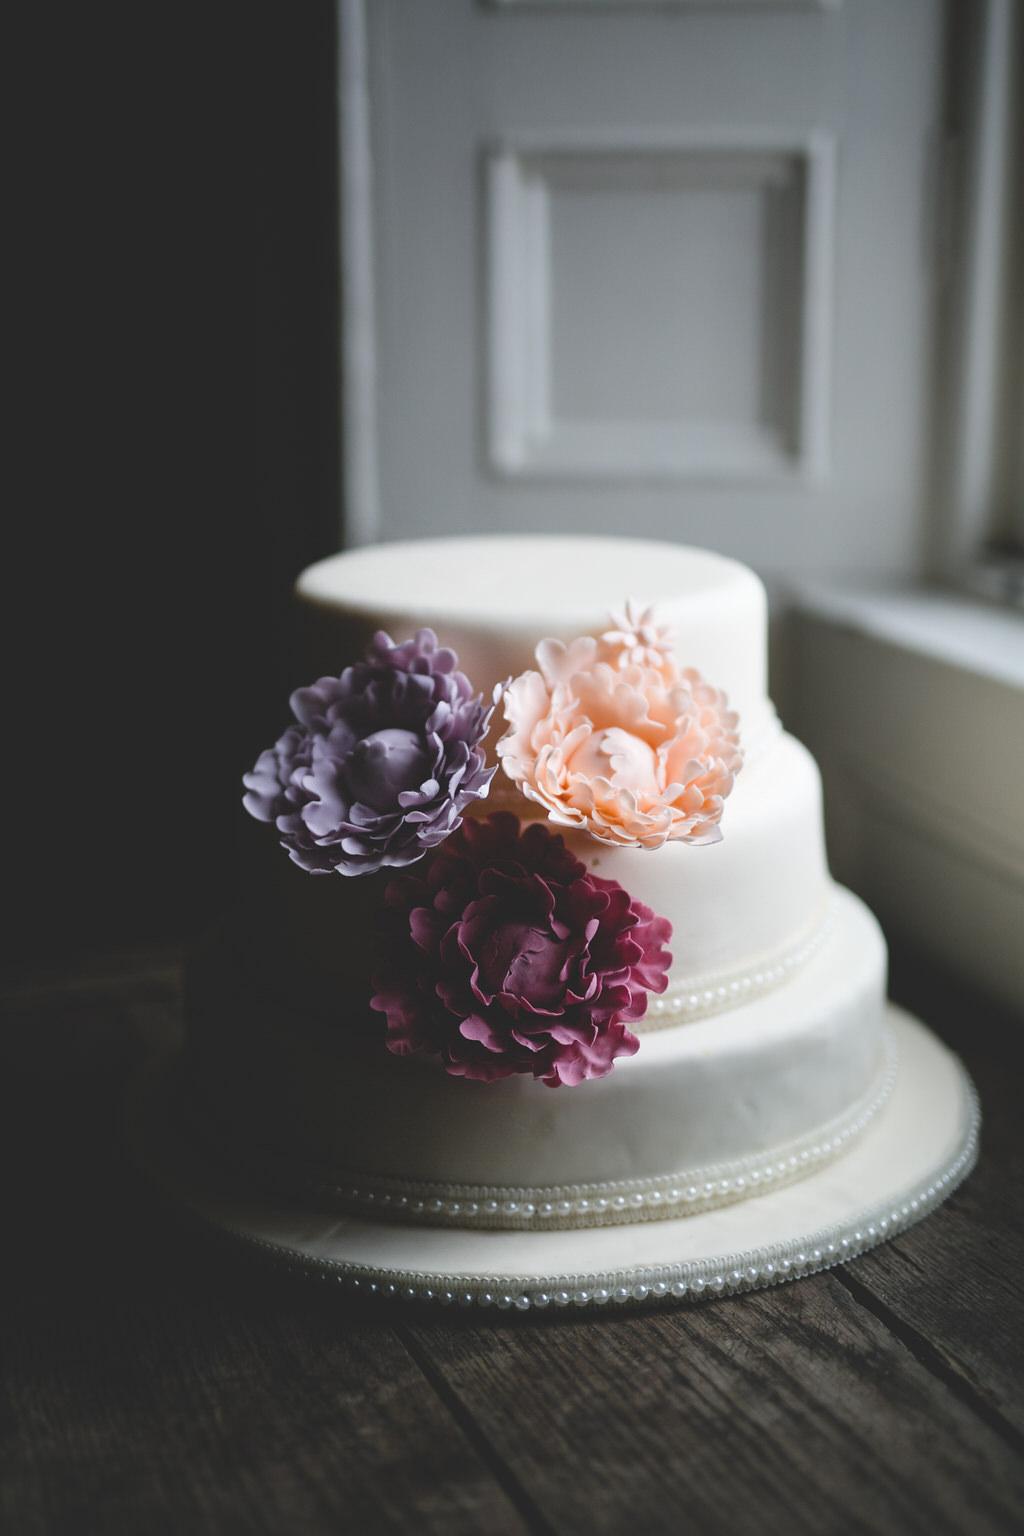 Simple, stylish & elegant wedding cake in white with iced flower decorations